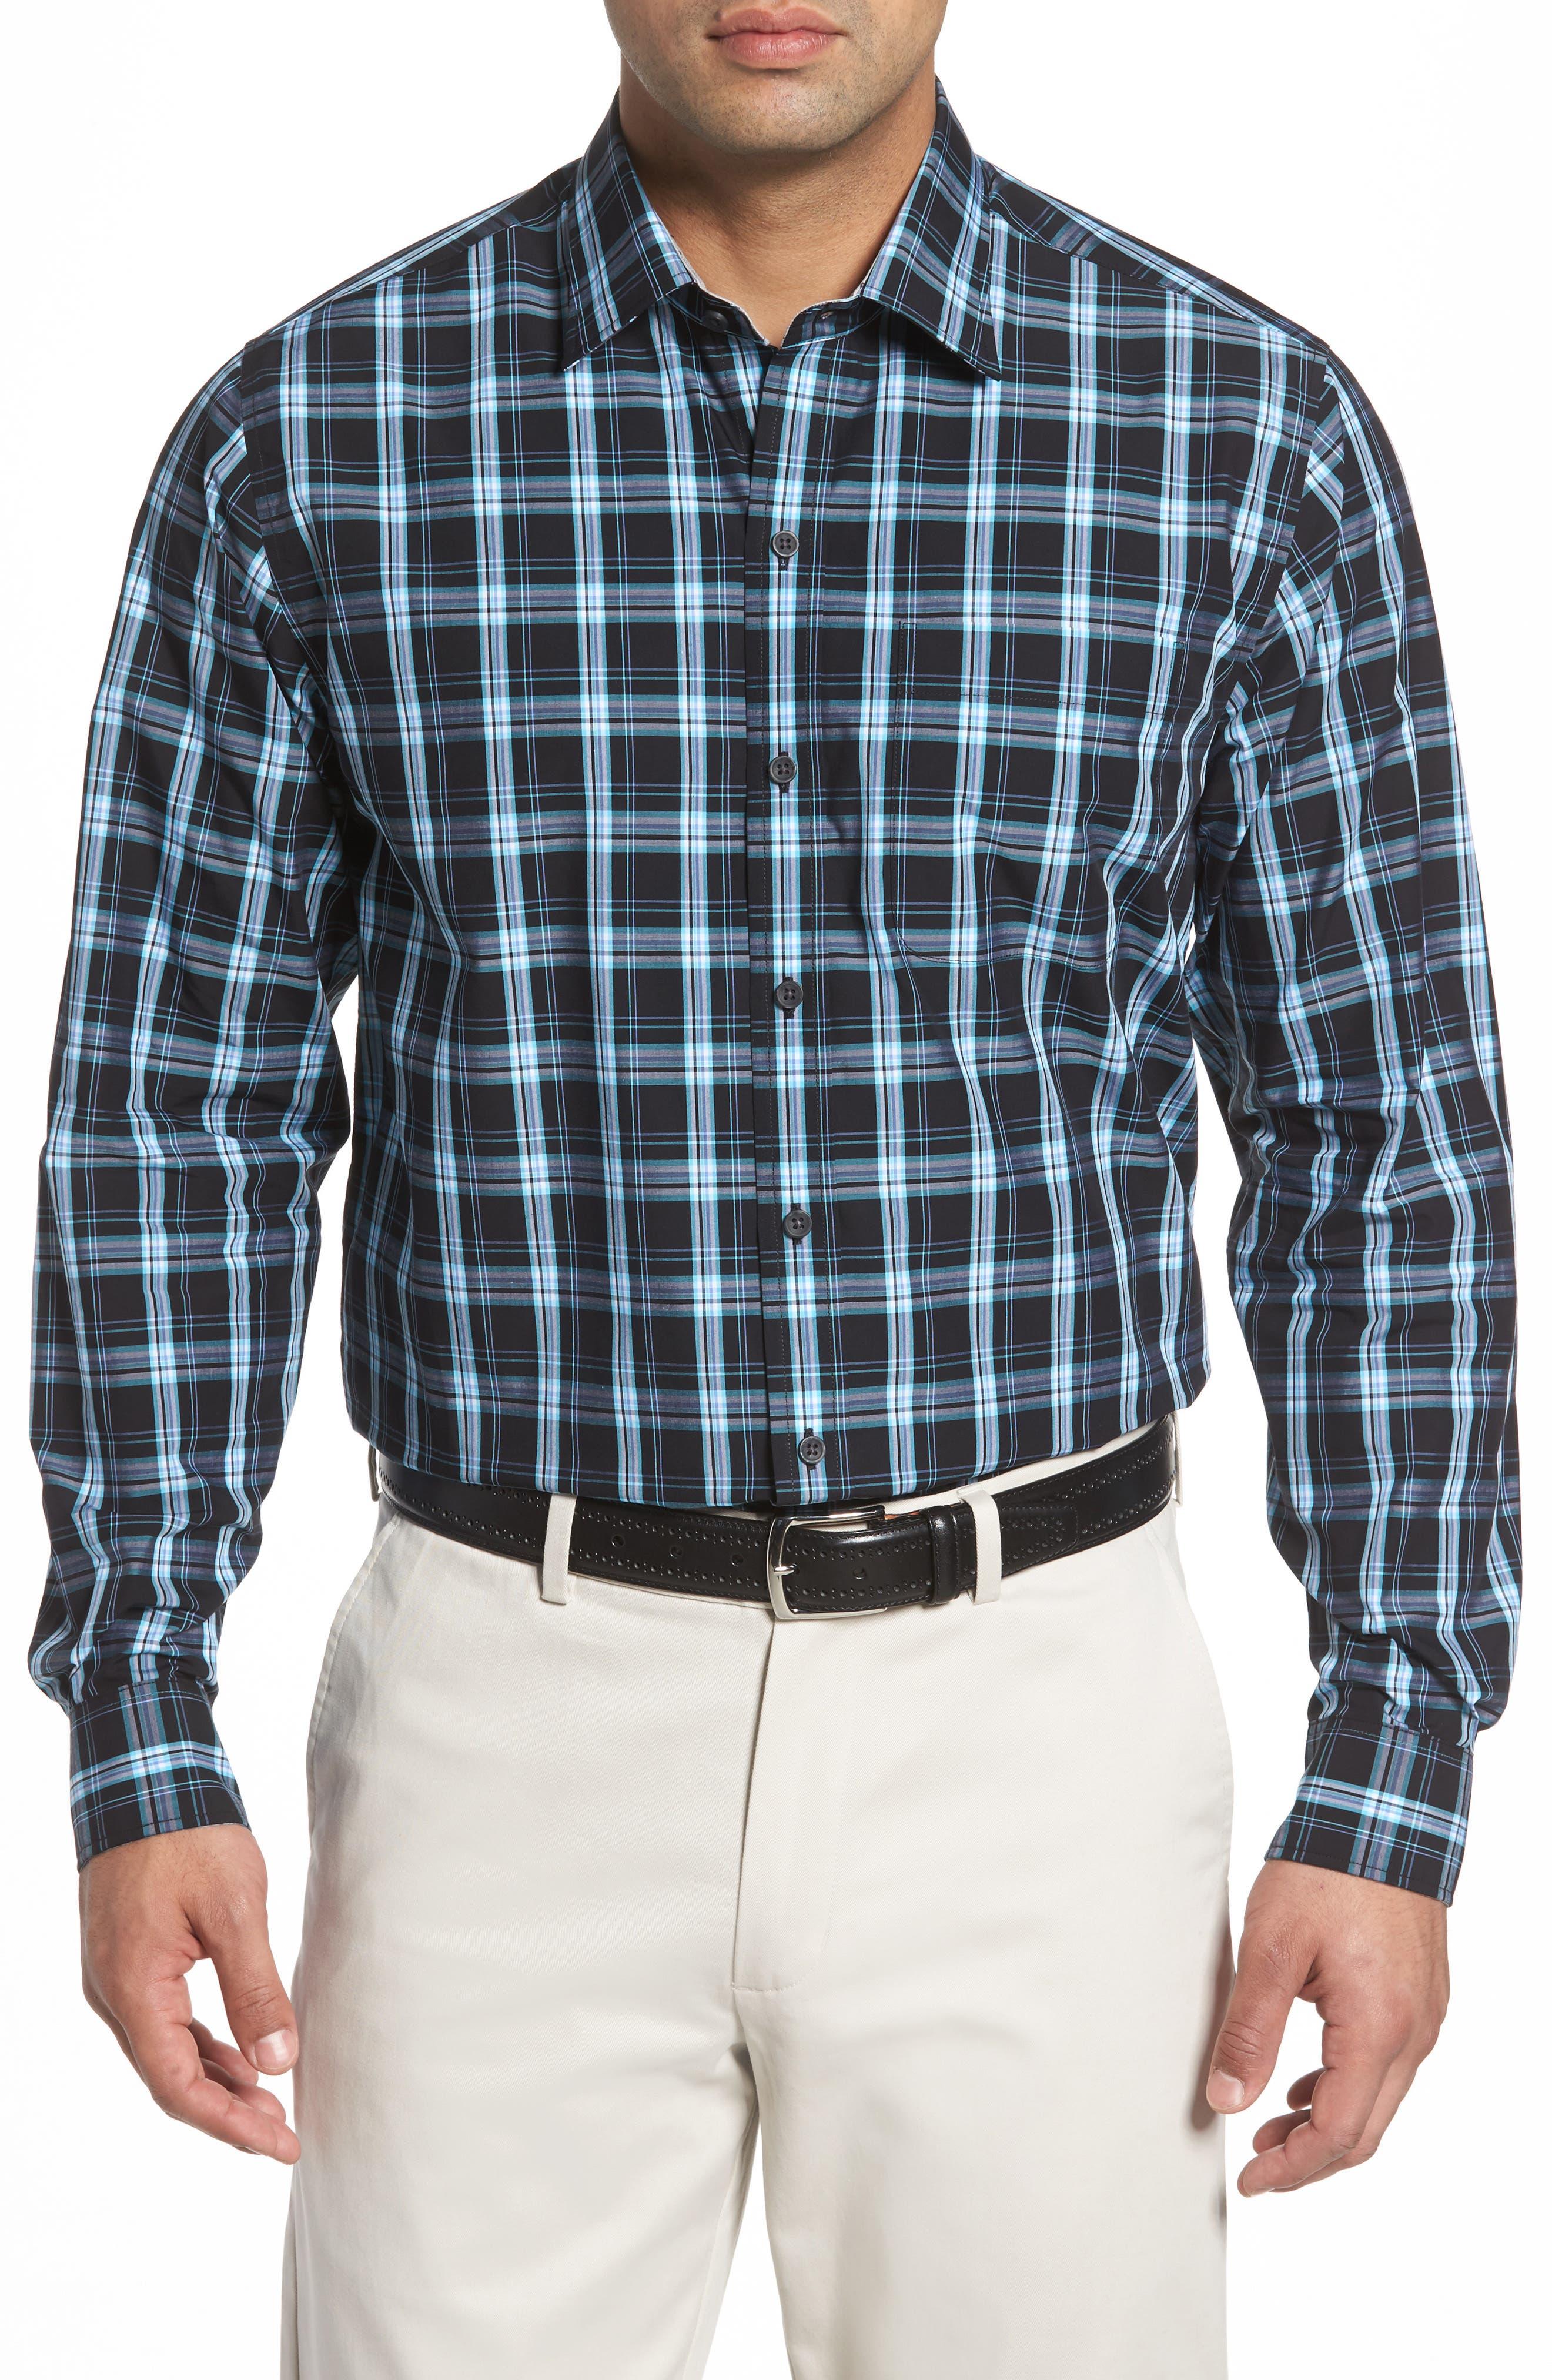 Summerland Non-Iron Plaid Sport Shirt,                         Main,                         color, Wisteria